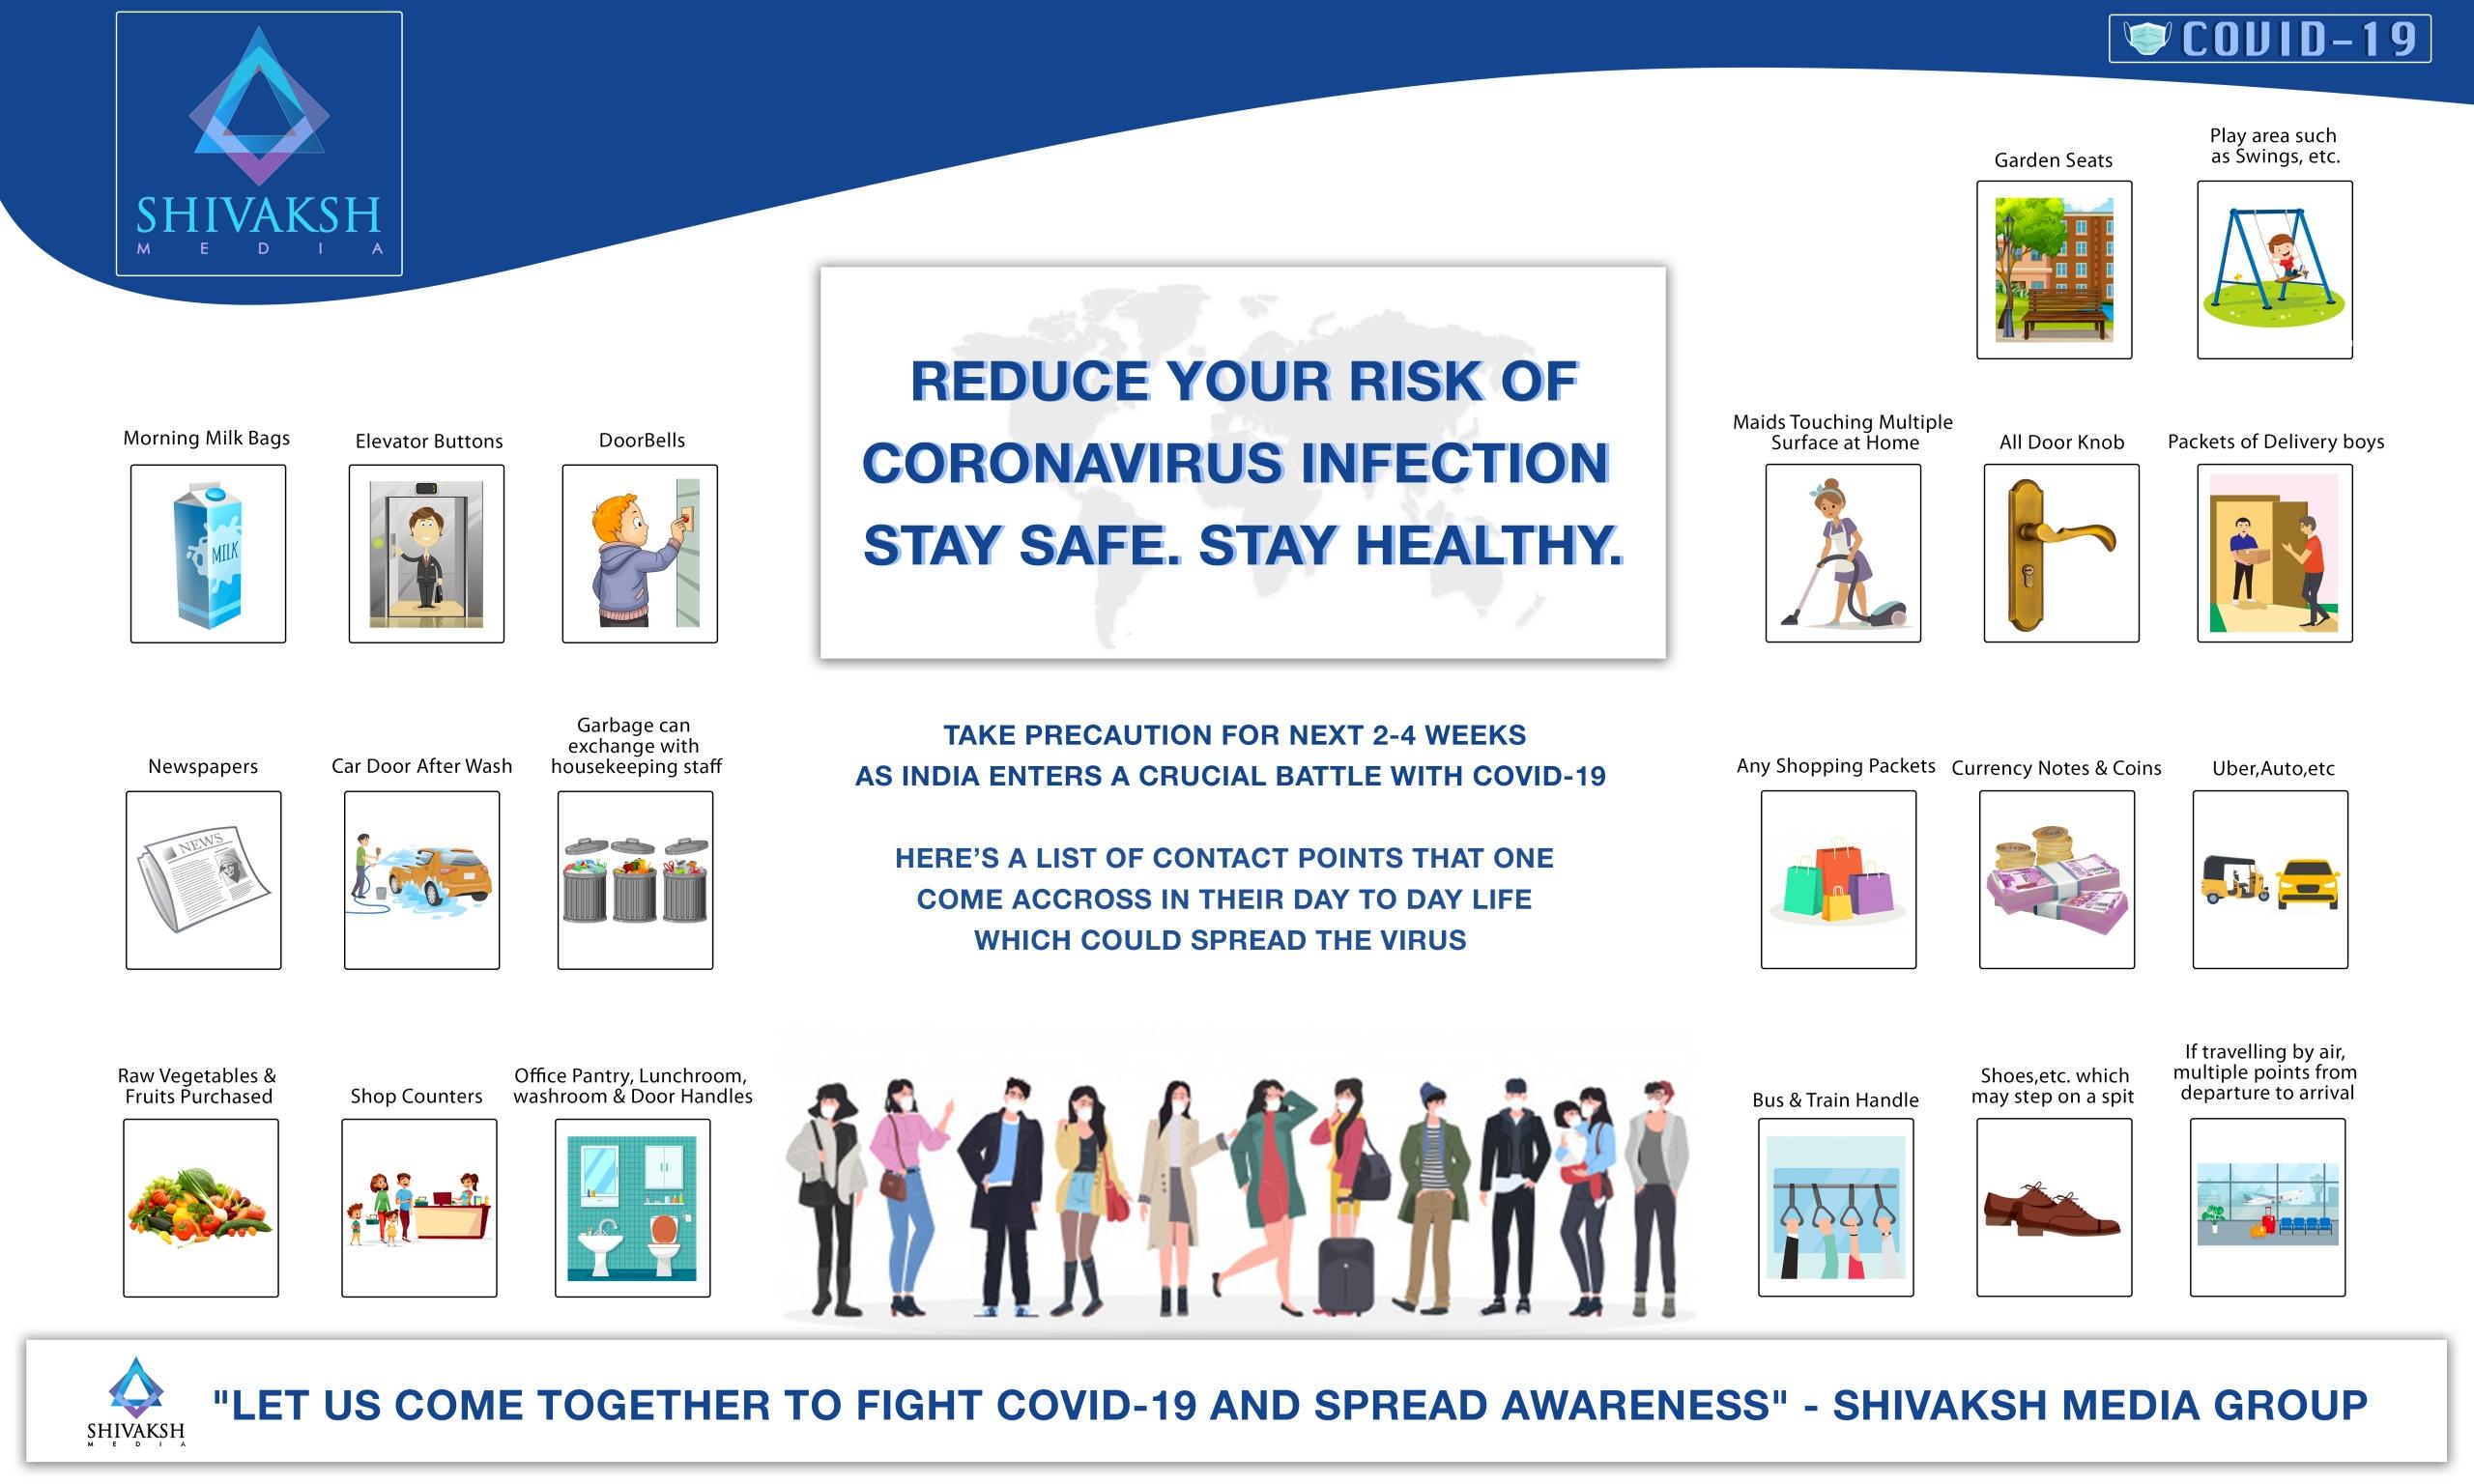 Reduce your risk of Coronavirus Infection